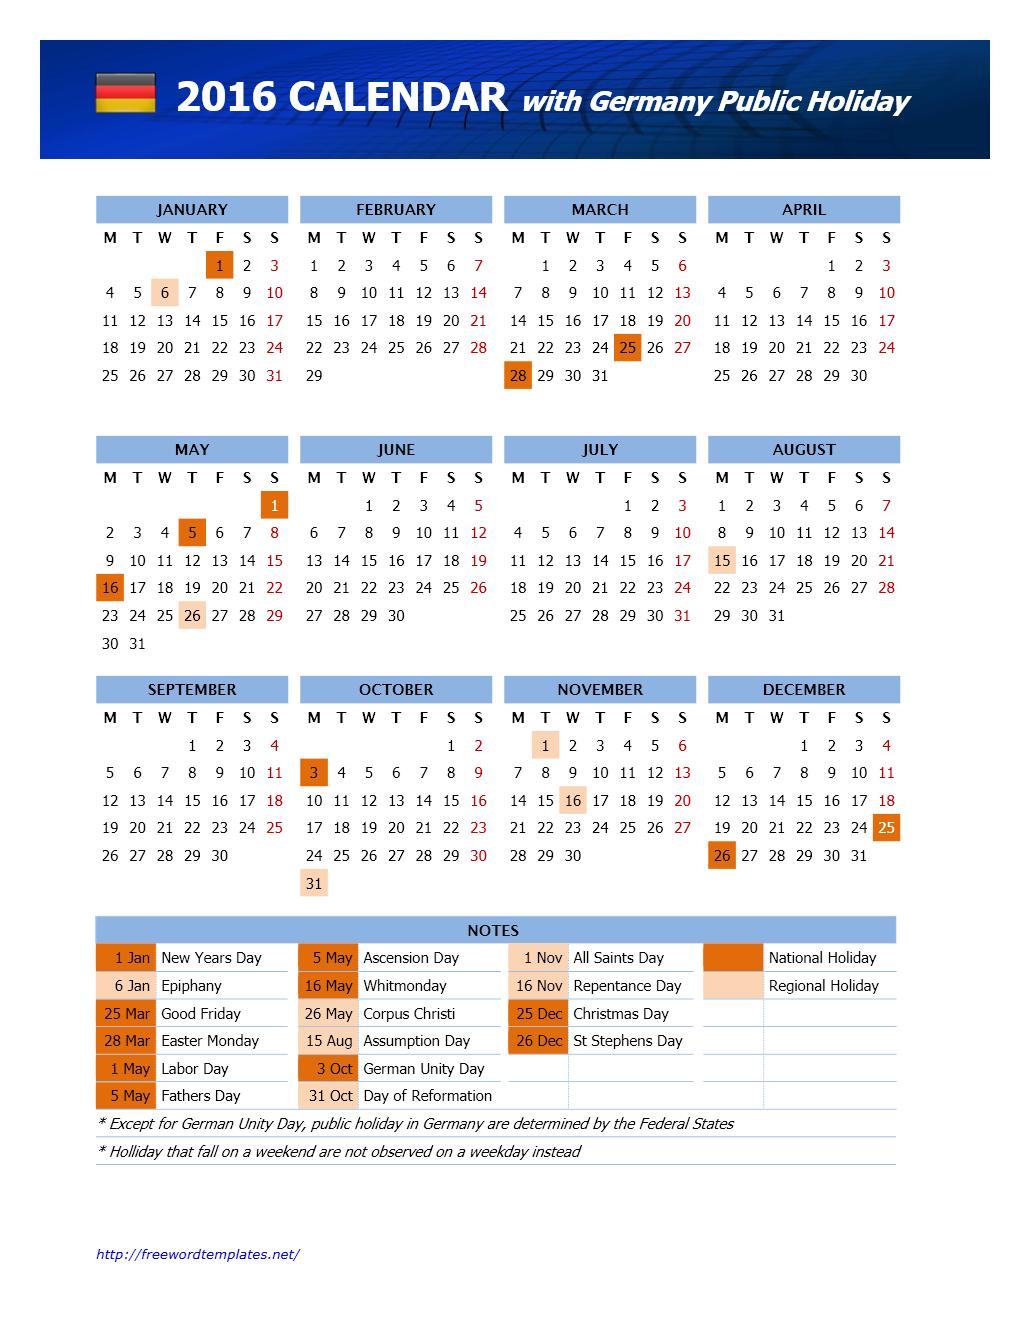 2016 Germany Public Holidays Calendar